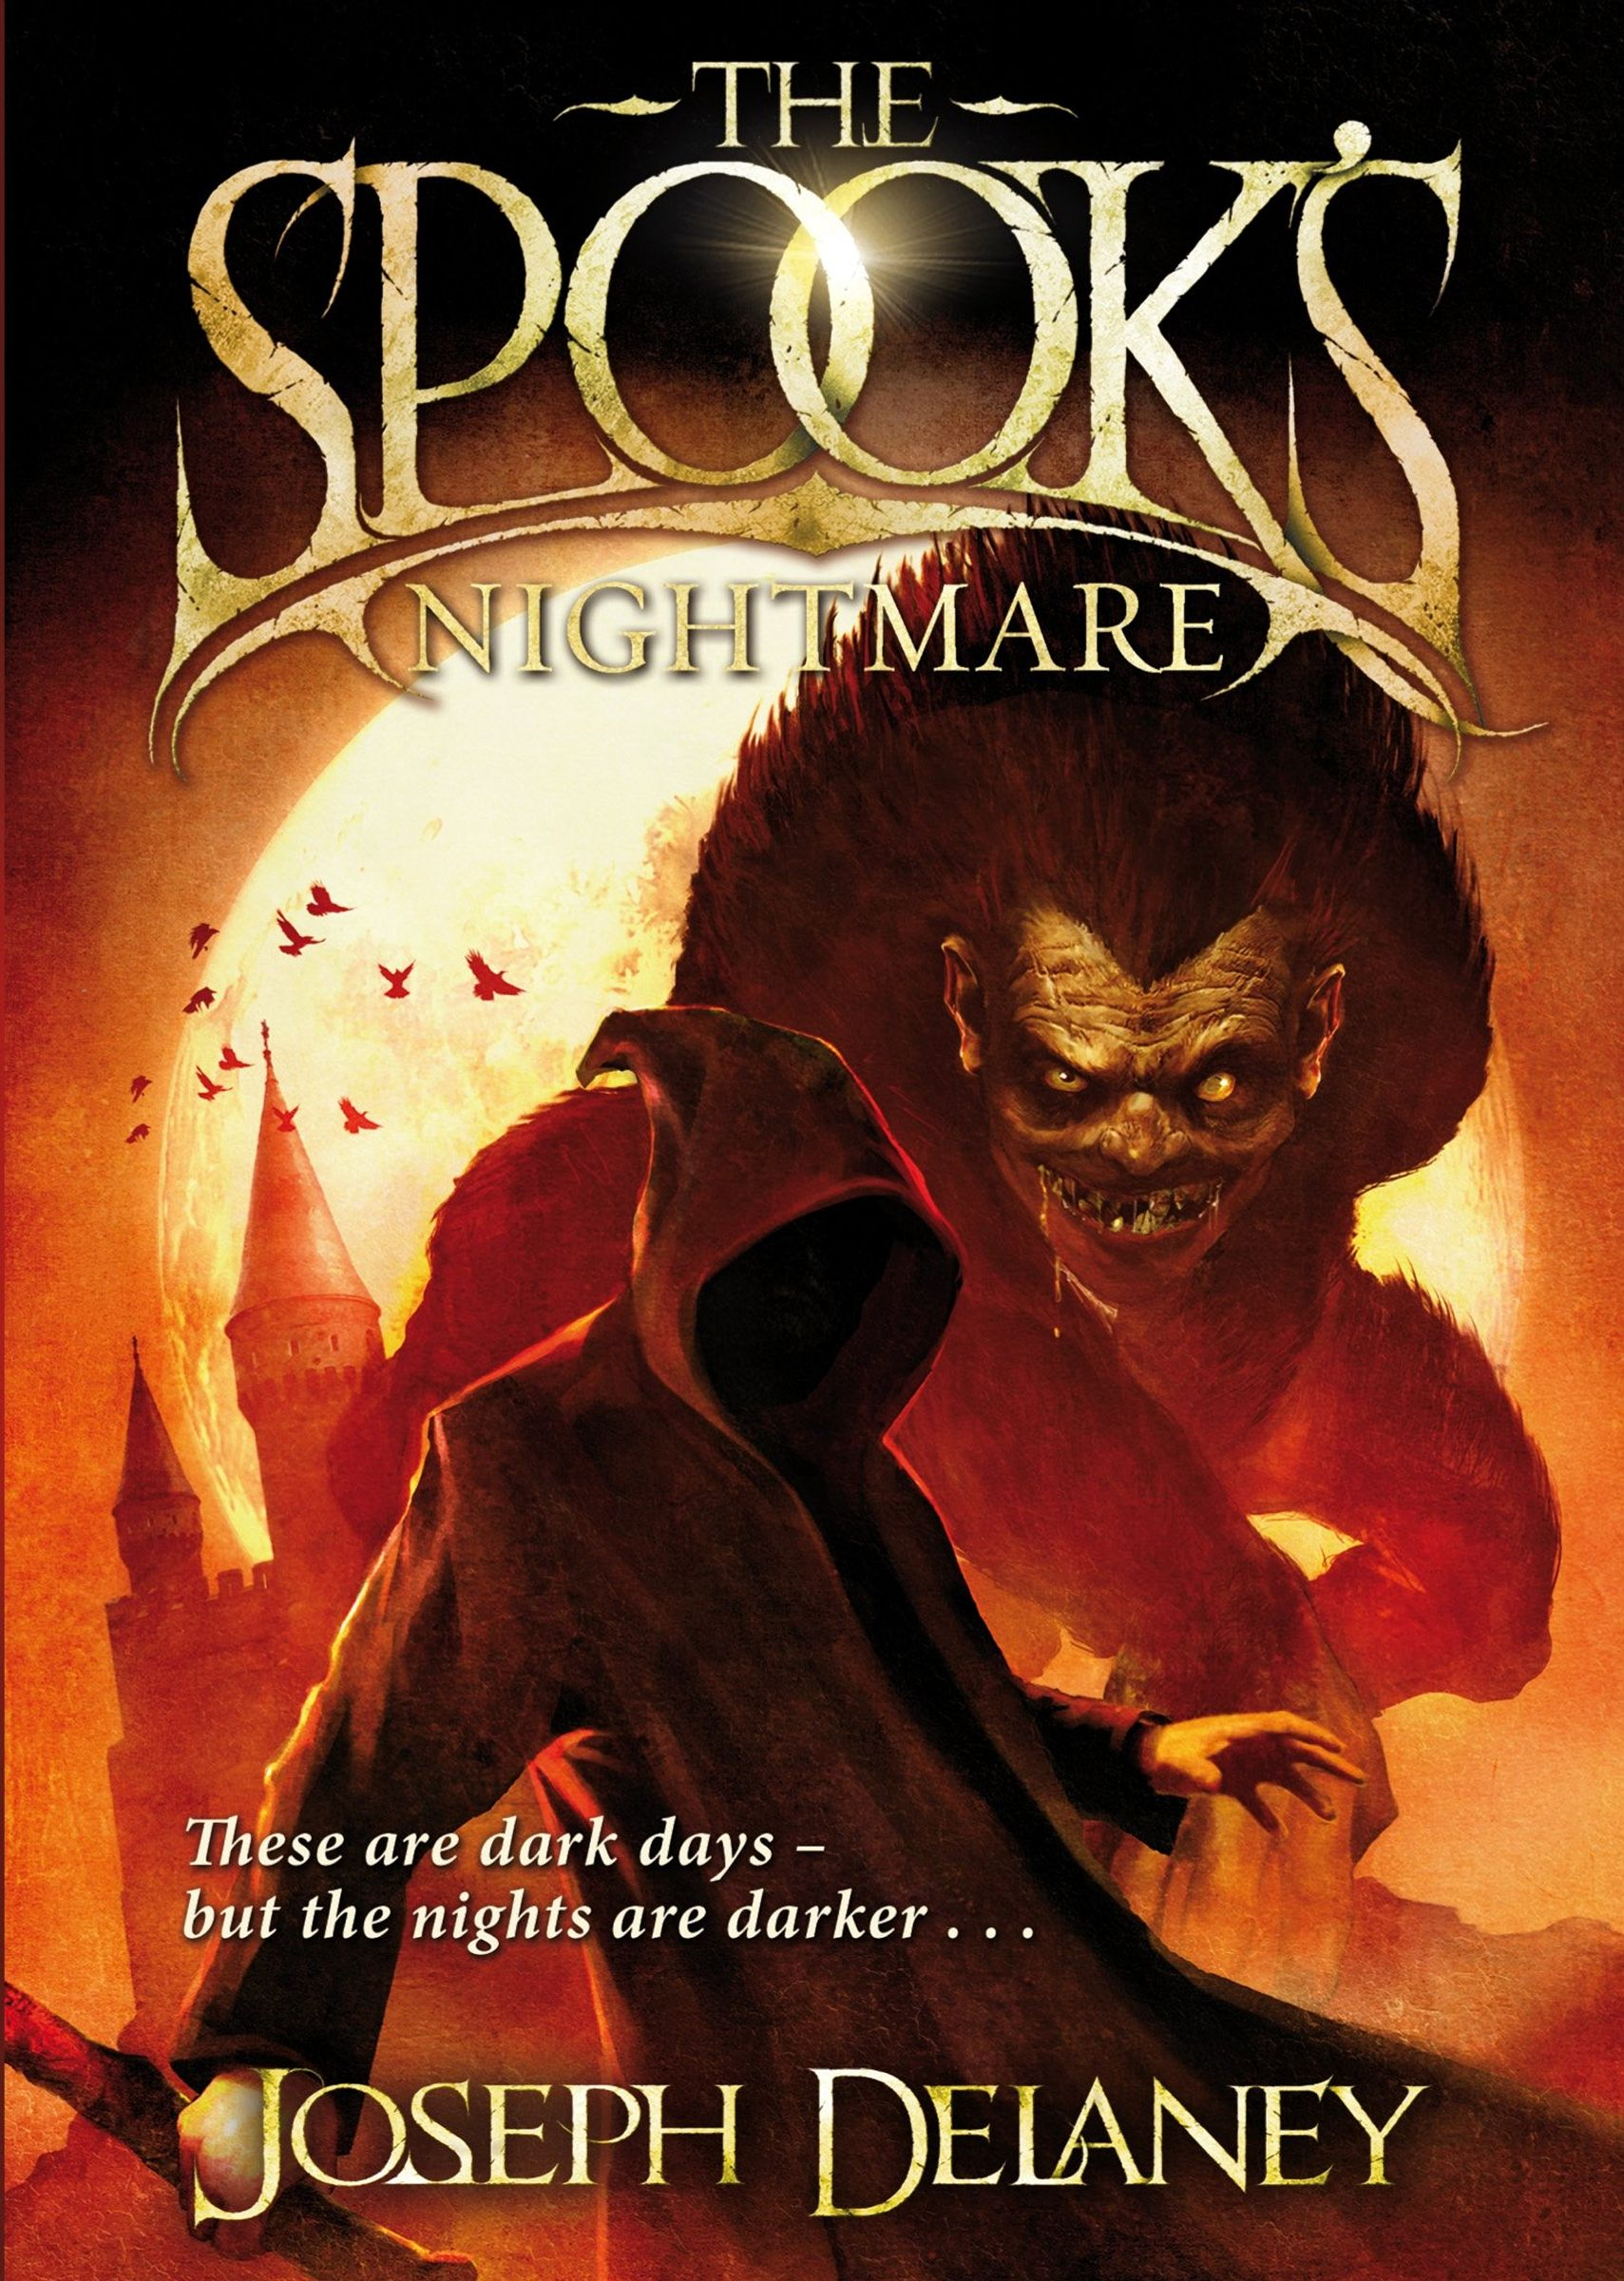 Joseph Delaney  (the Wardstone Chronicles #7) The Spook's Nightmare